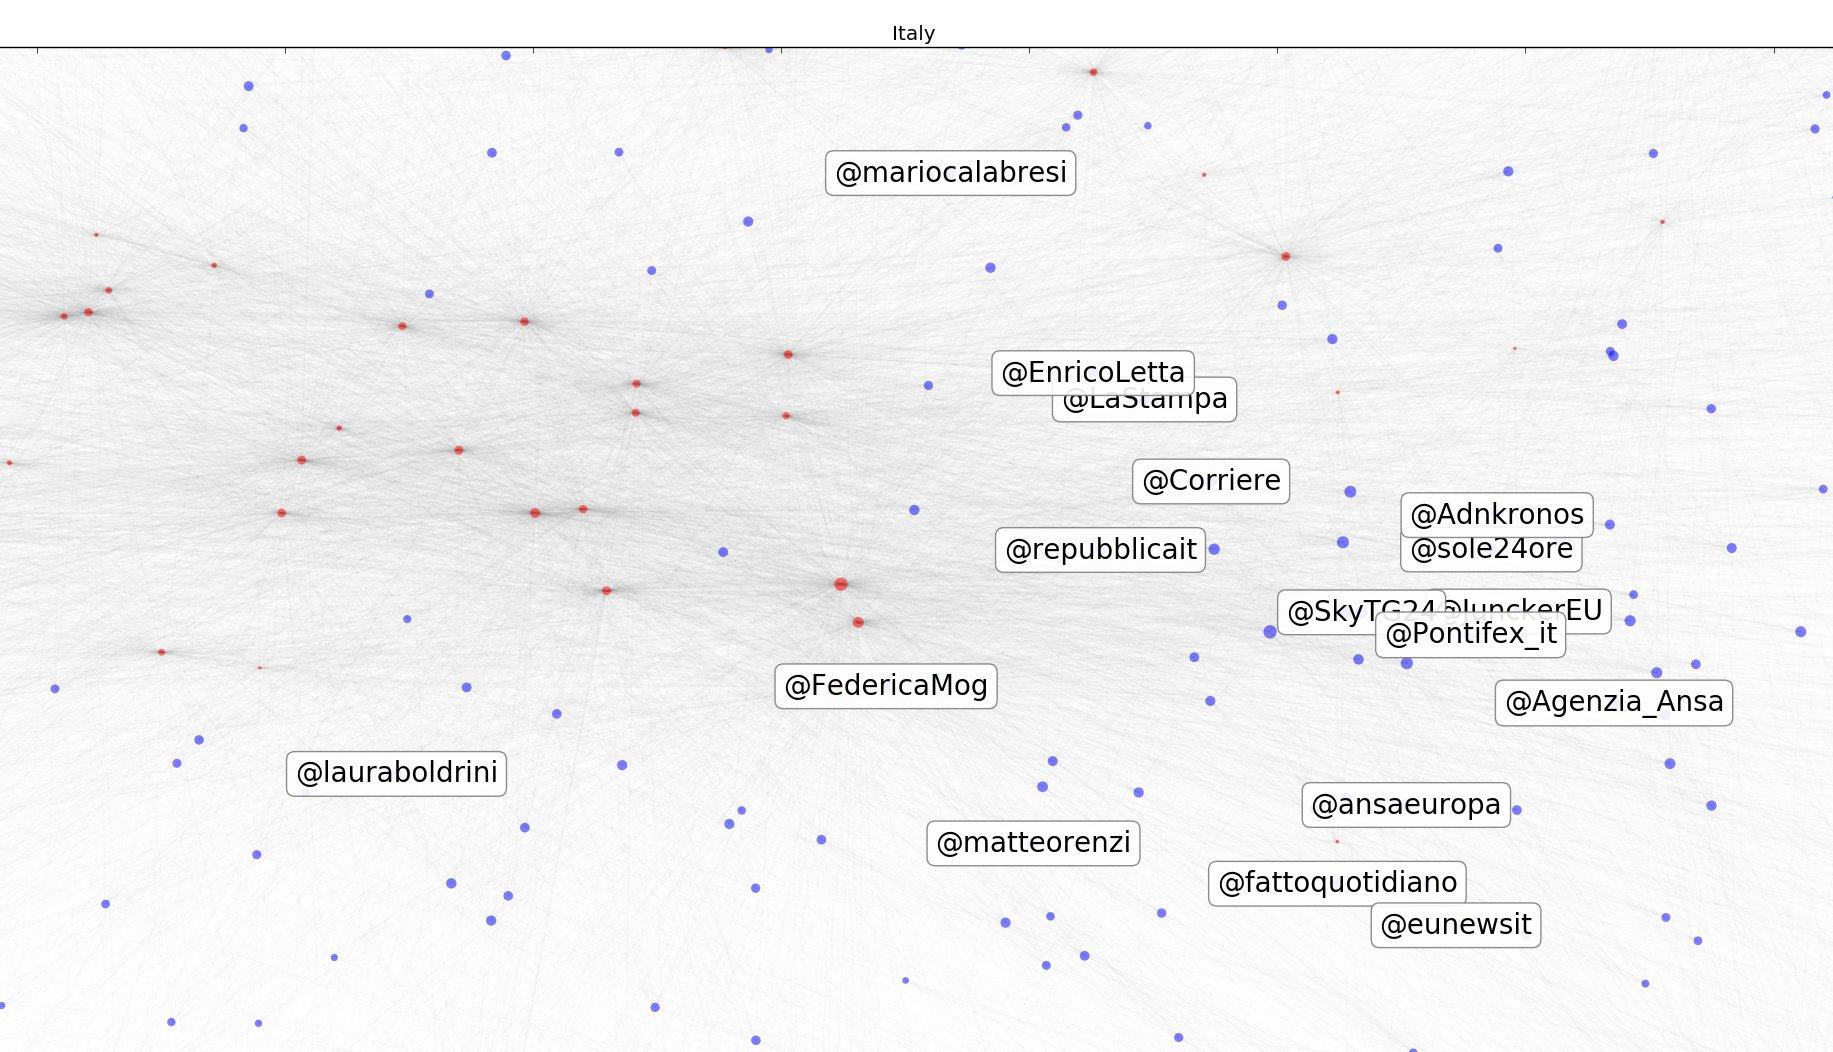 Twitter, Parlamento europeo, eurodeputati, Eunews, Elfilab